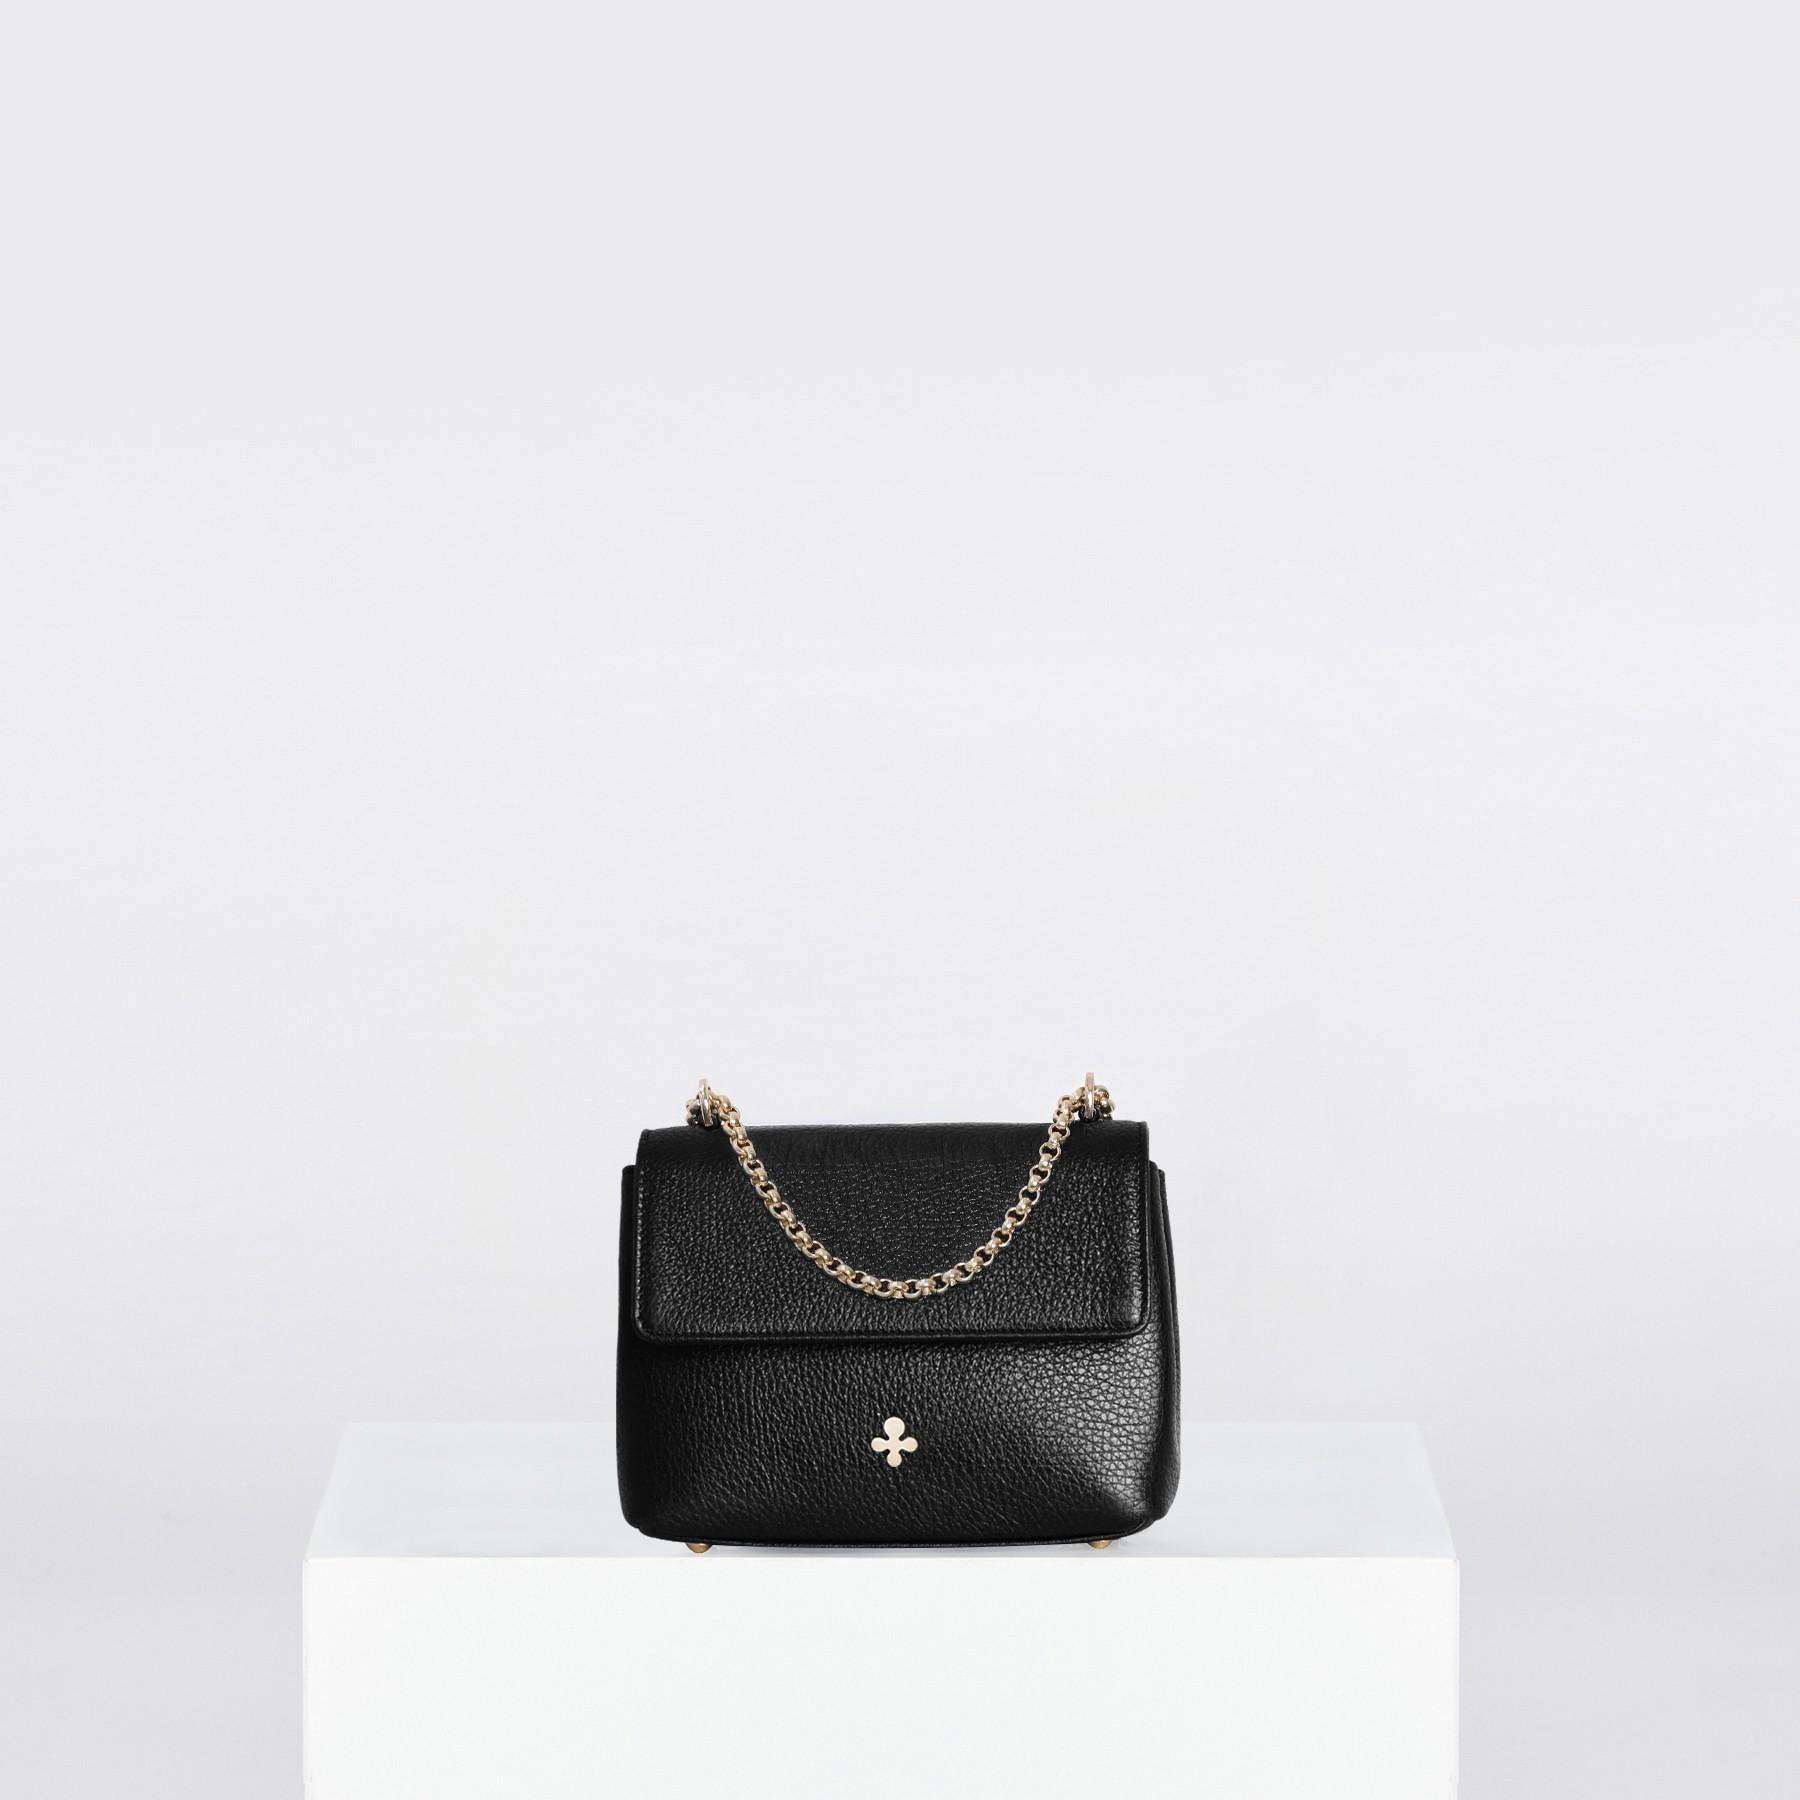 Mini sac ZOE, noir métallique